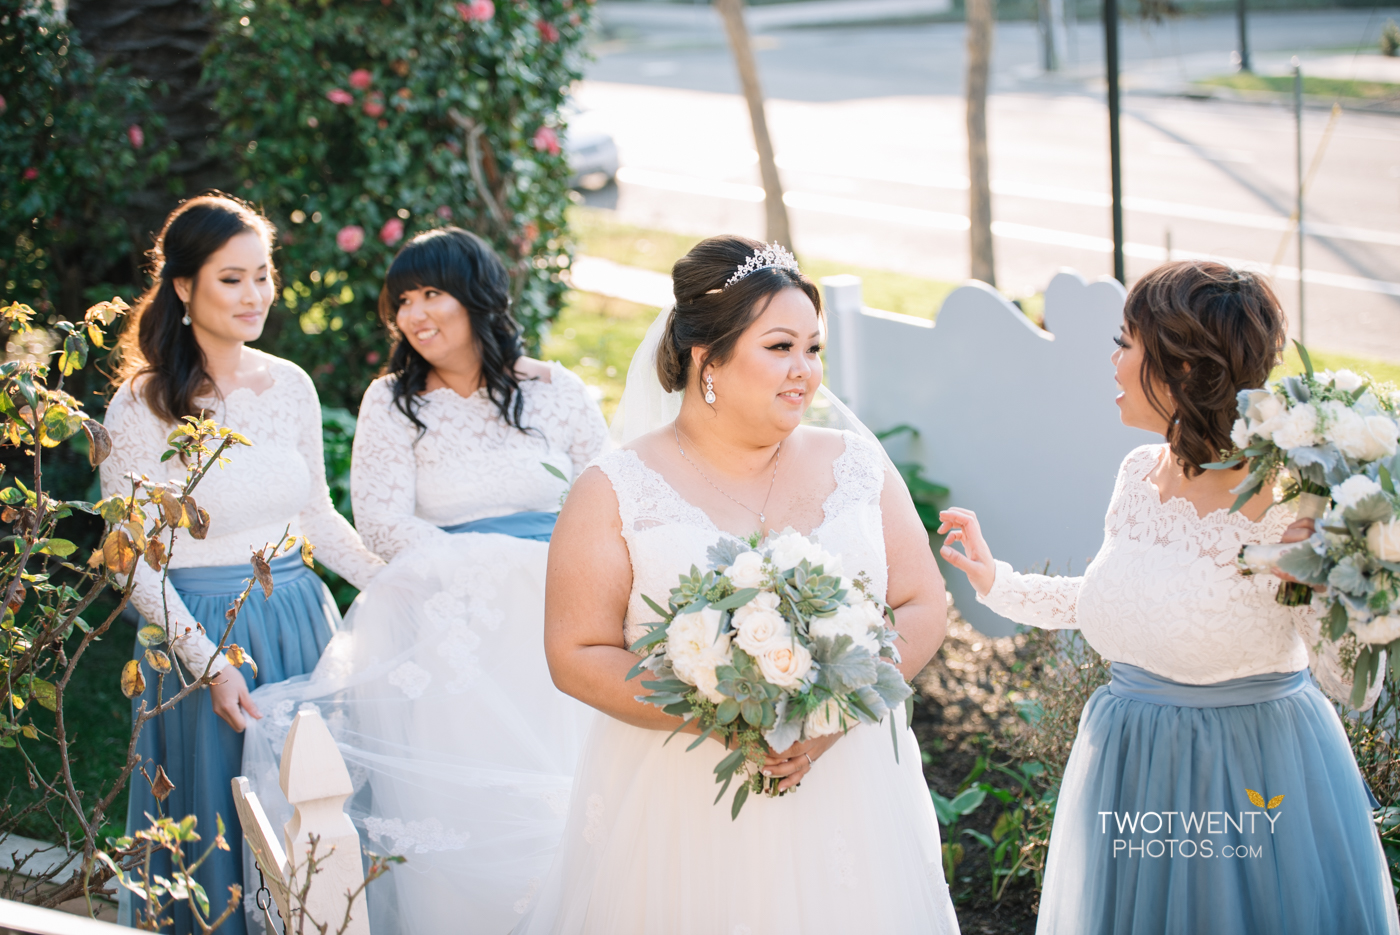 vizcaya-pavilion-sacramento-wedding-photographer-20